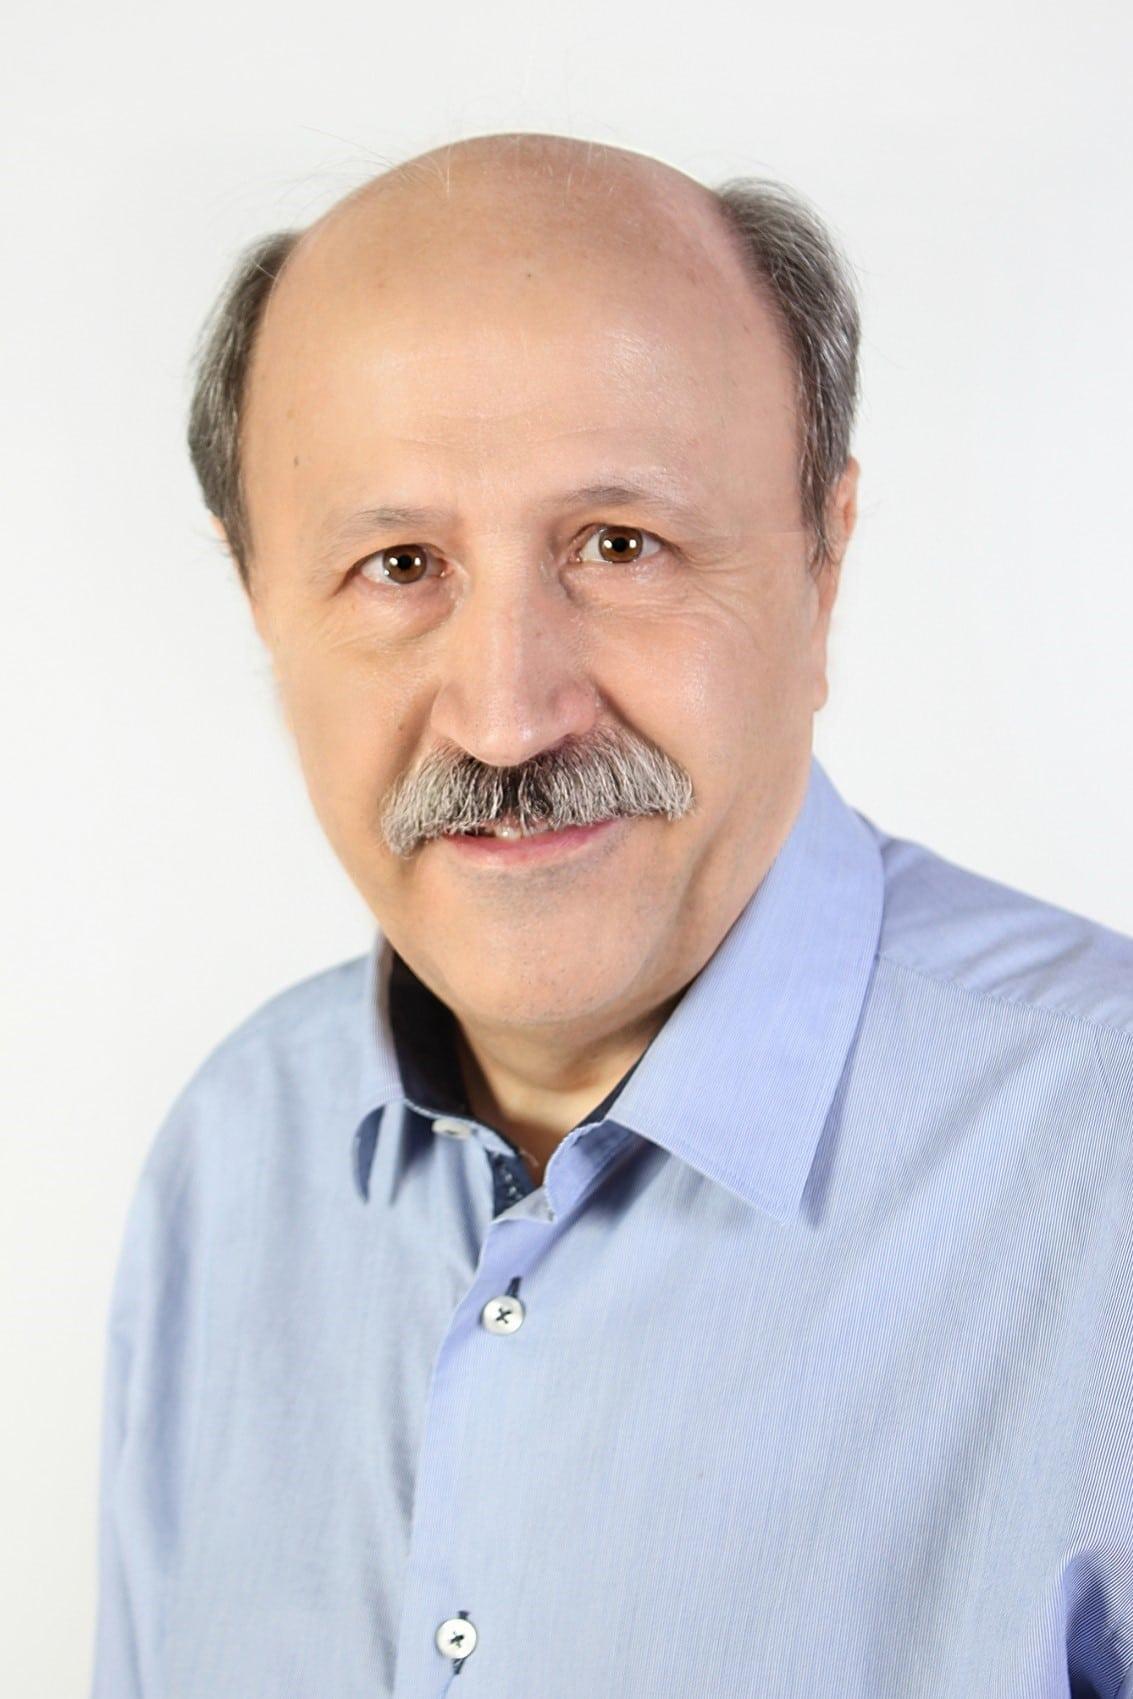 Antonio Chamorro